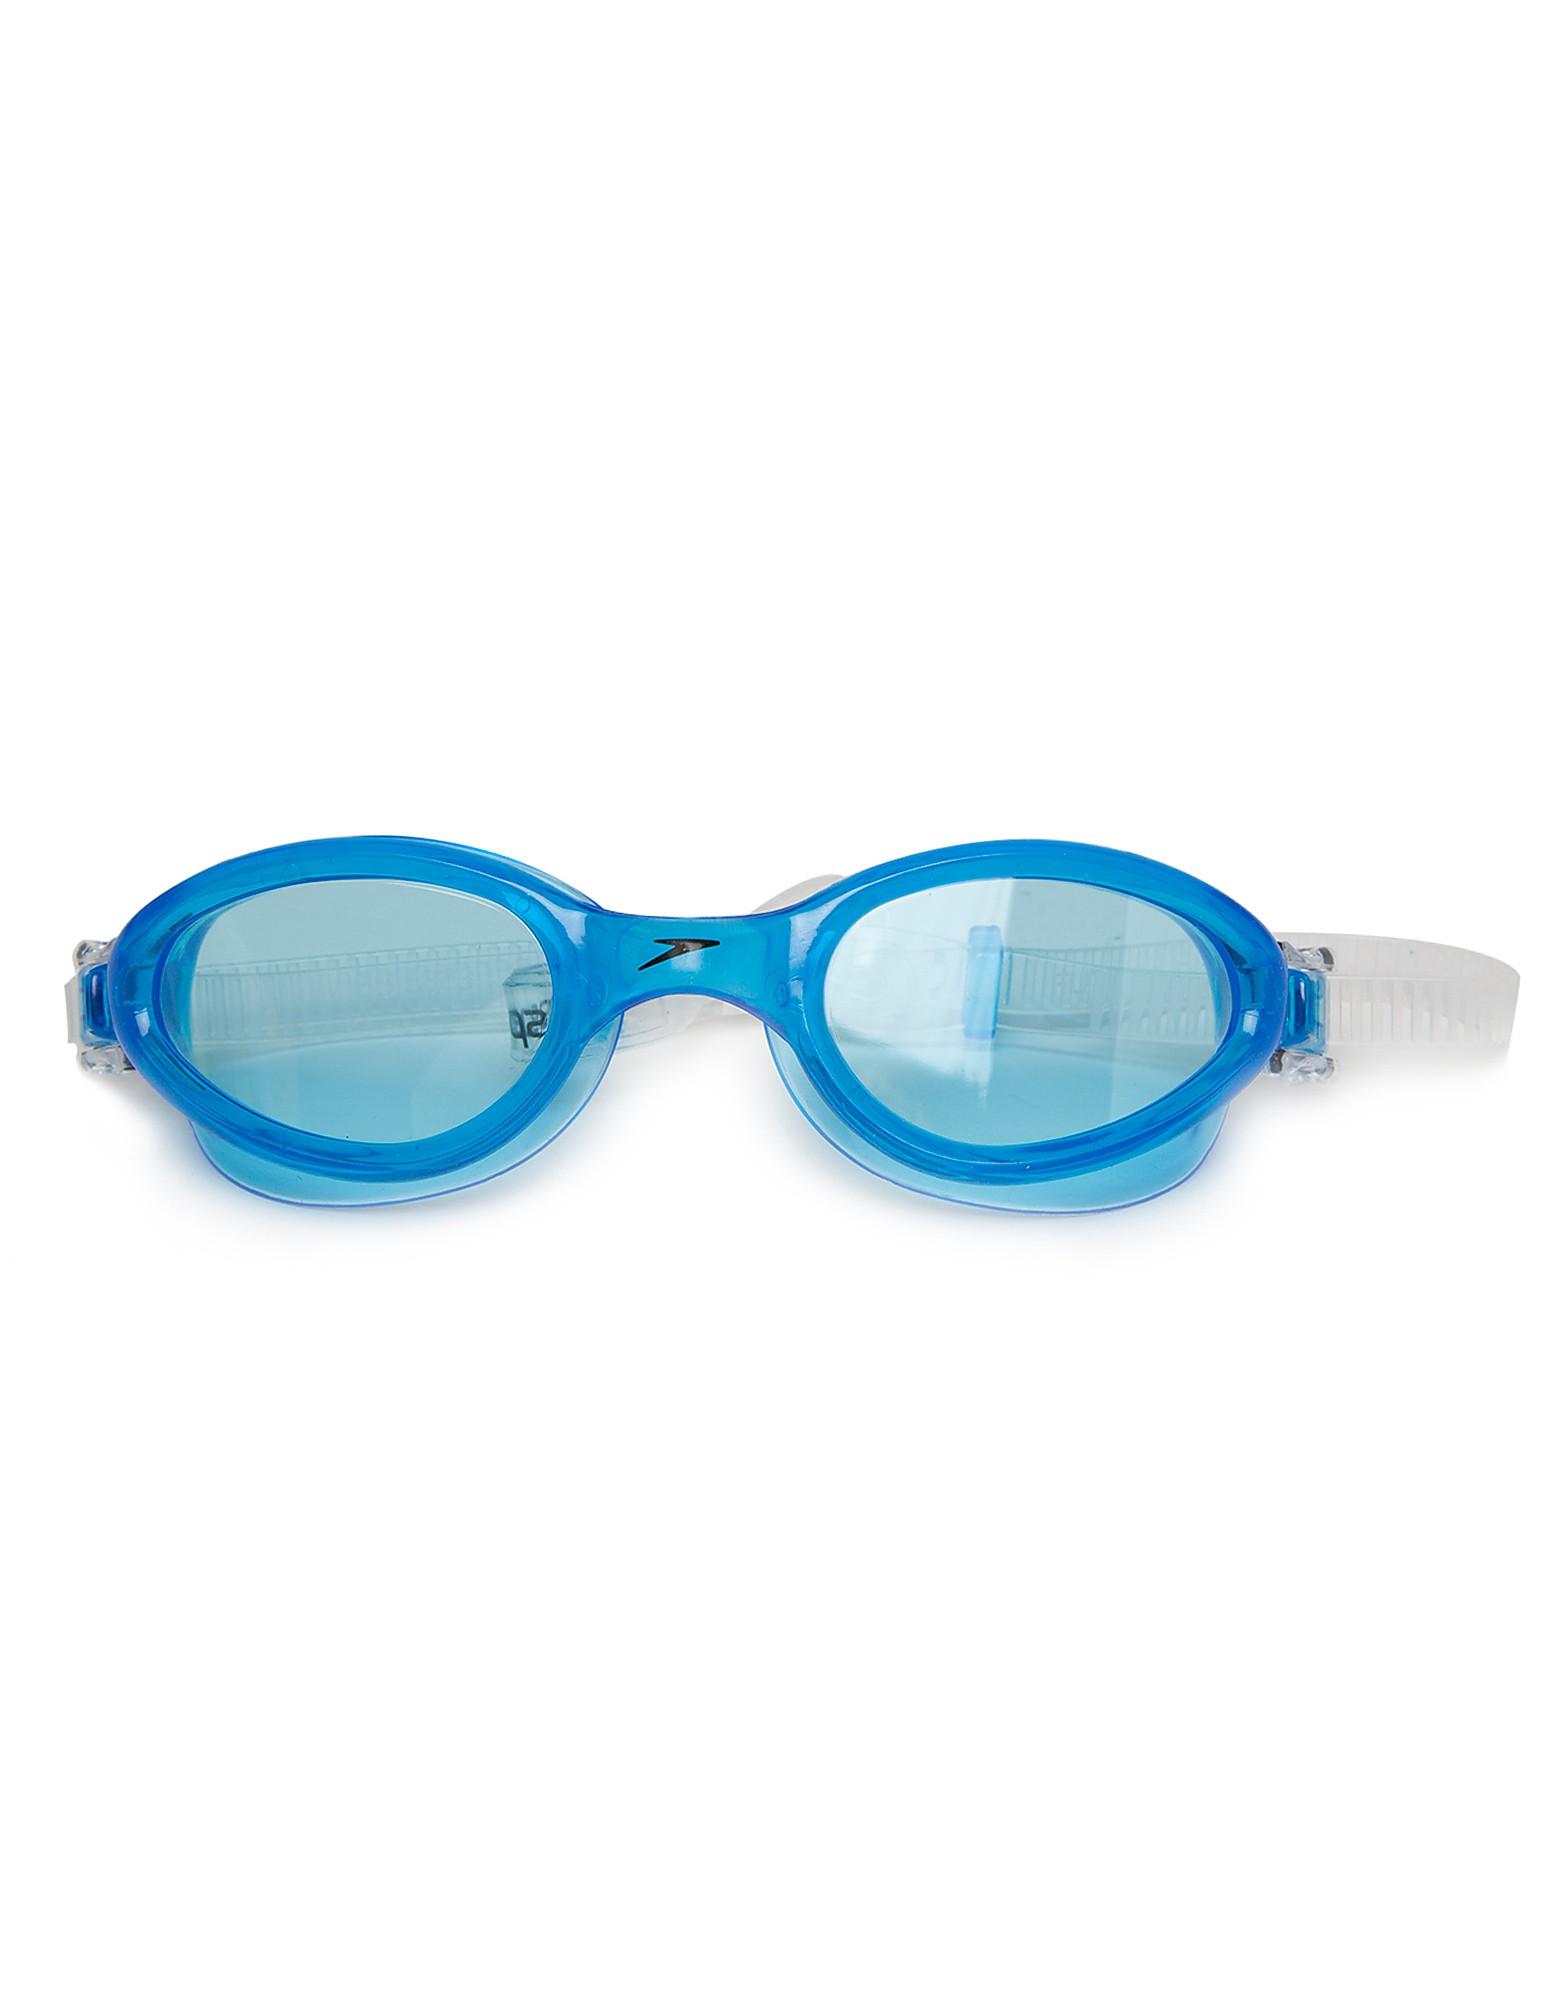 Speedo Futura One Goggles